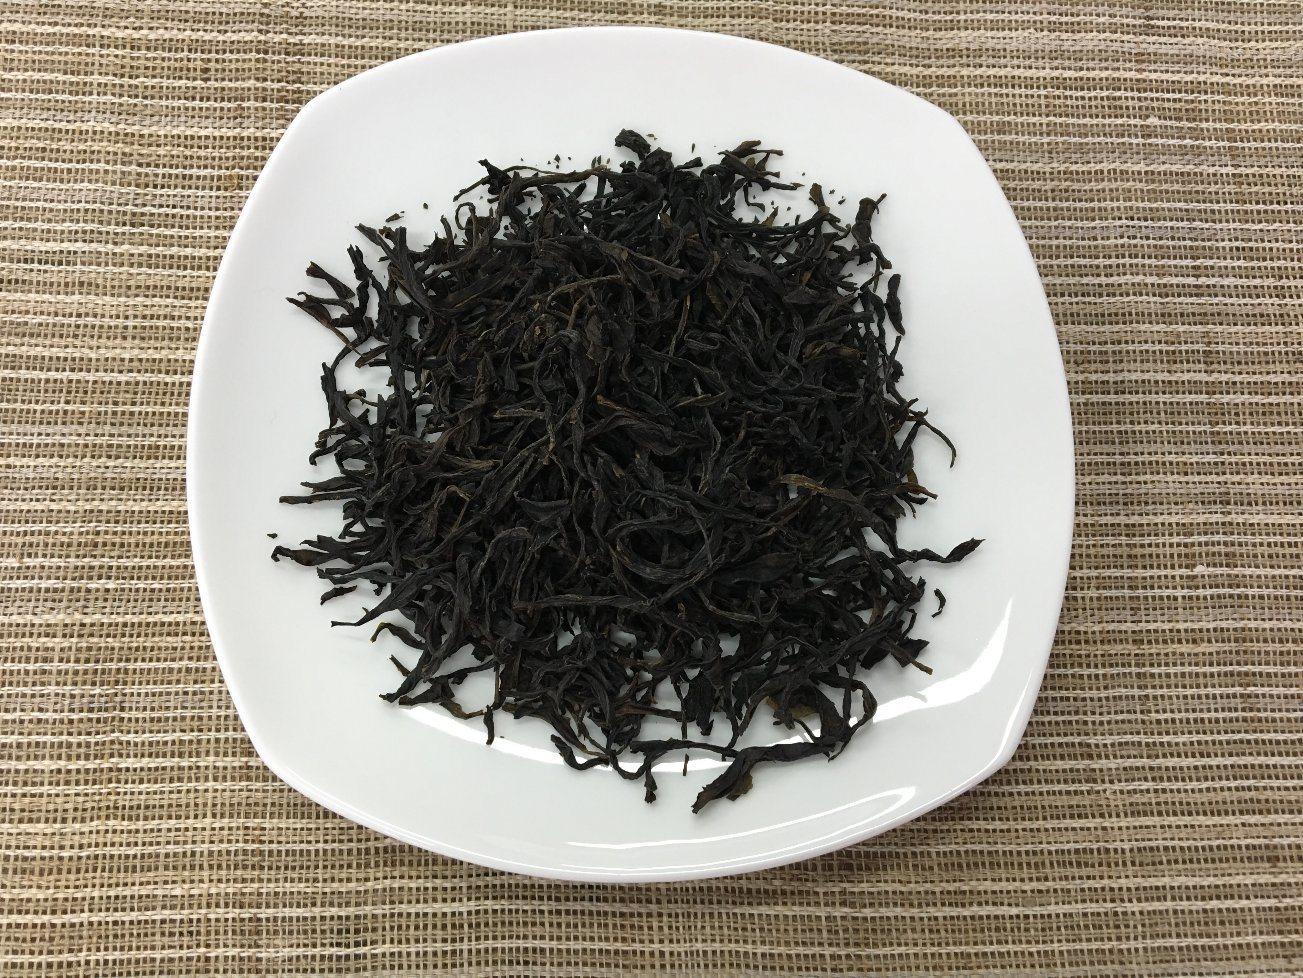 China Tea Mi LAN Phenix Dan Cong Chinese Oolong Tea